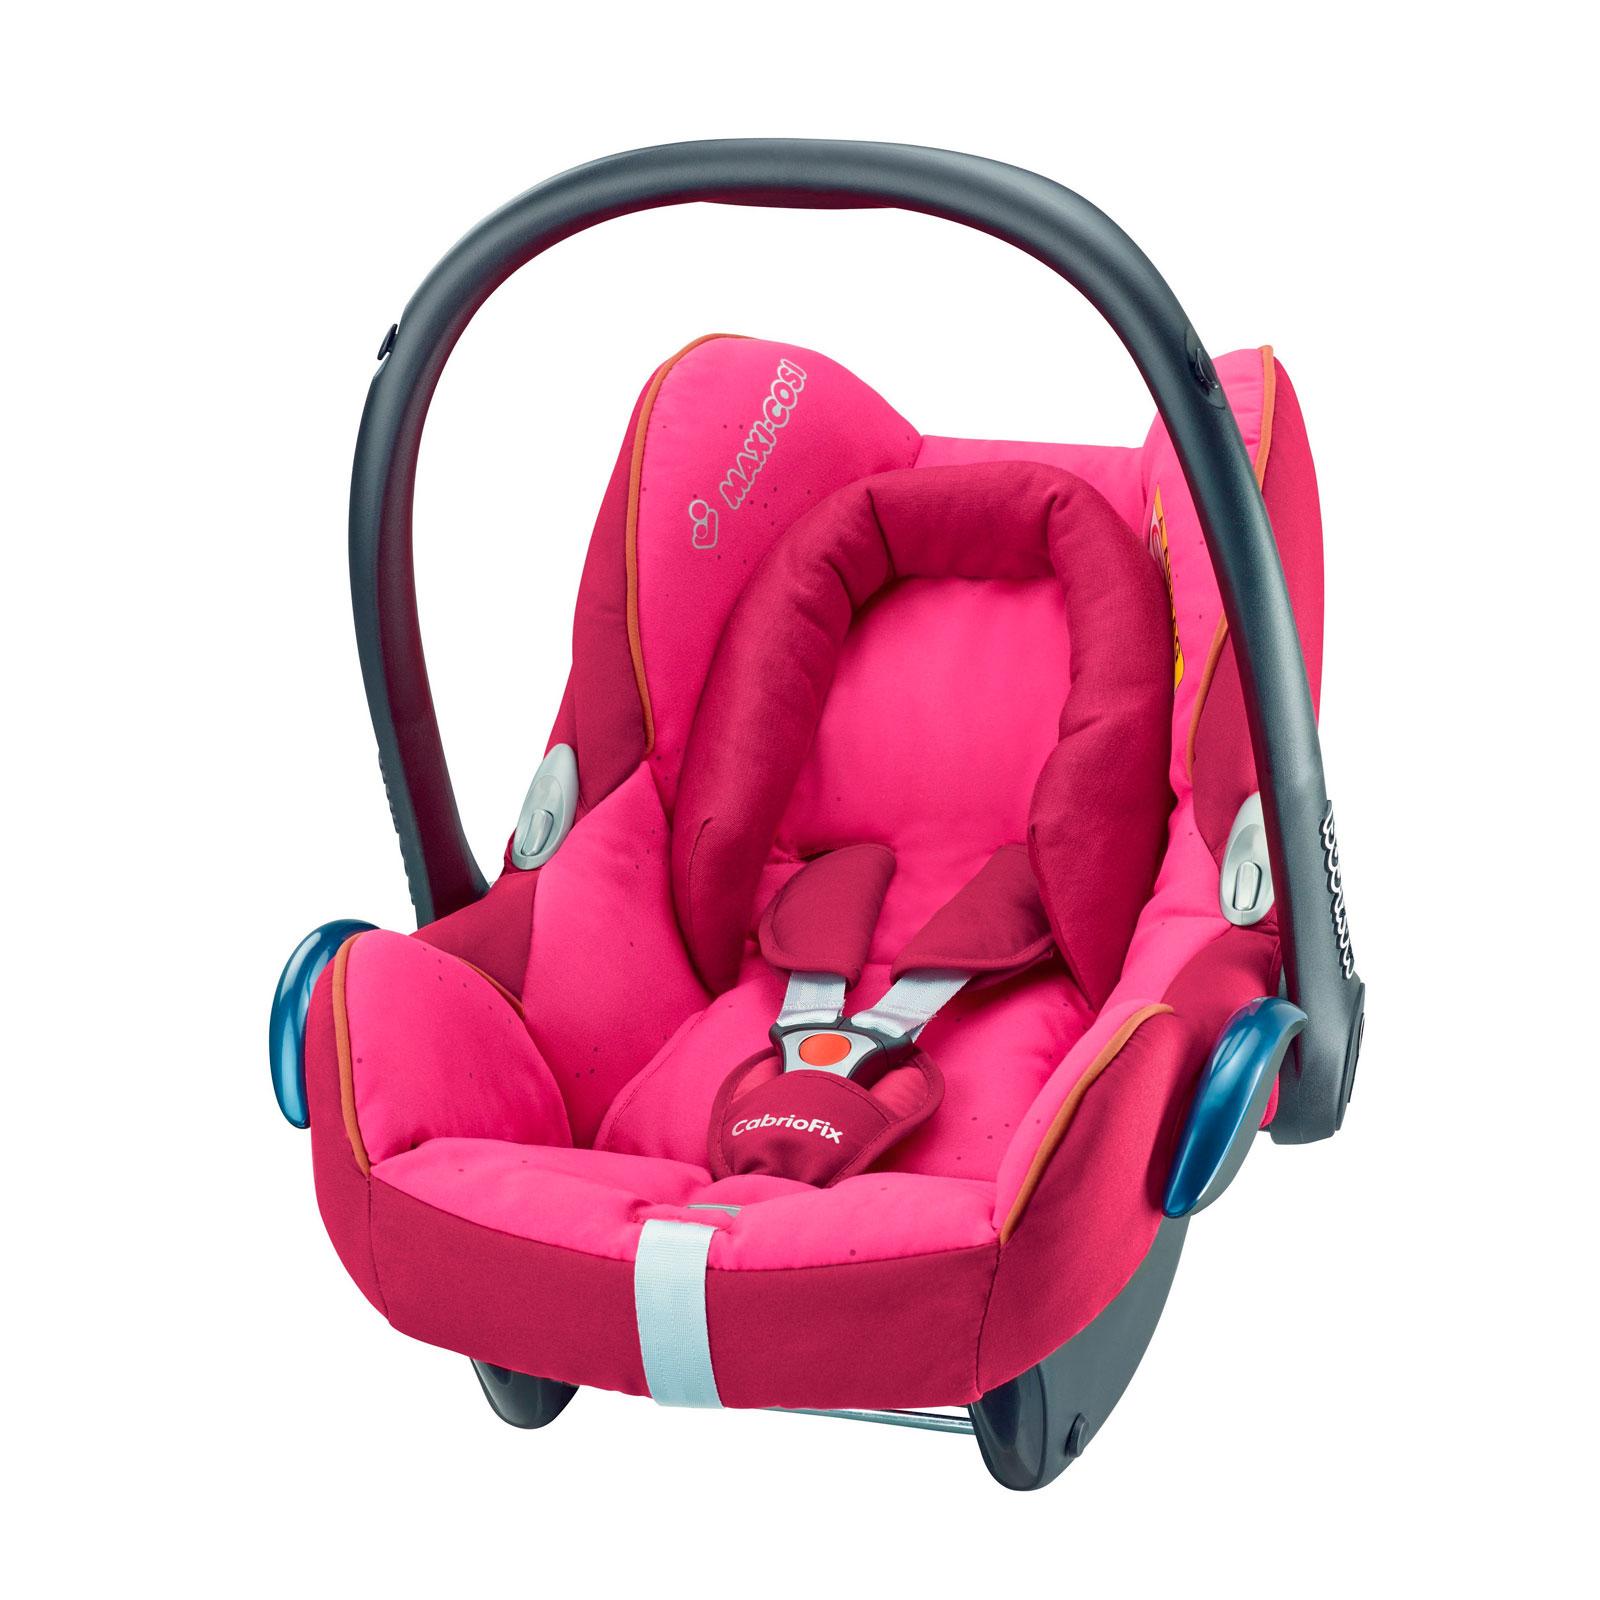 ���������� Maxi-Cosi CabrioFix Berry Pink